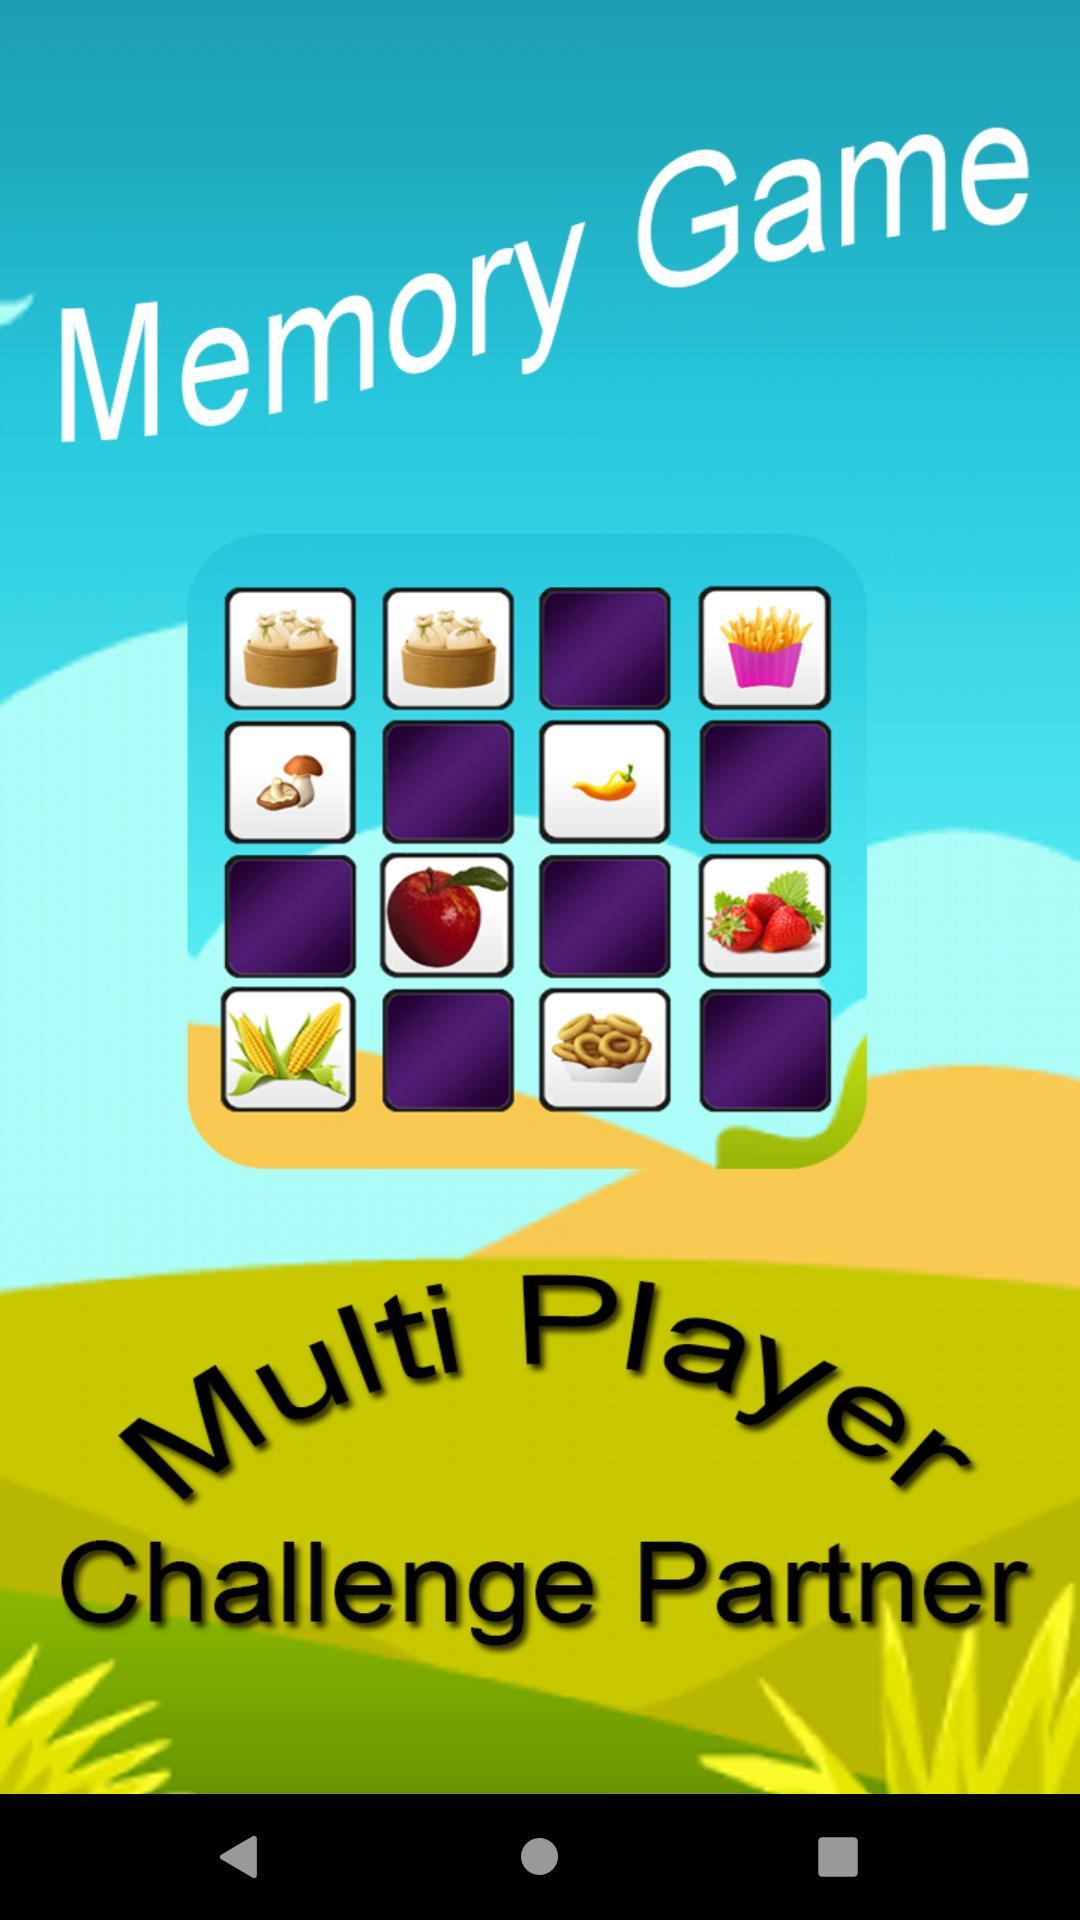 Memory Game (Challenge Partner) 1.5 Screenshot 1